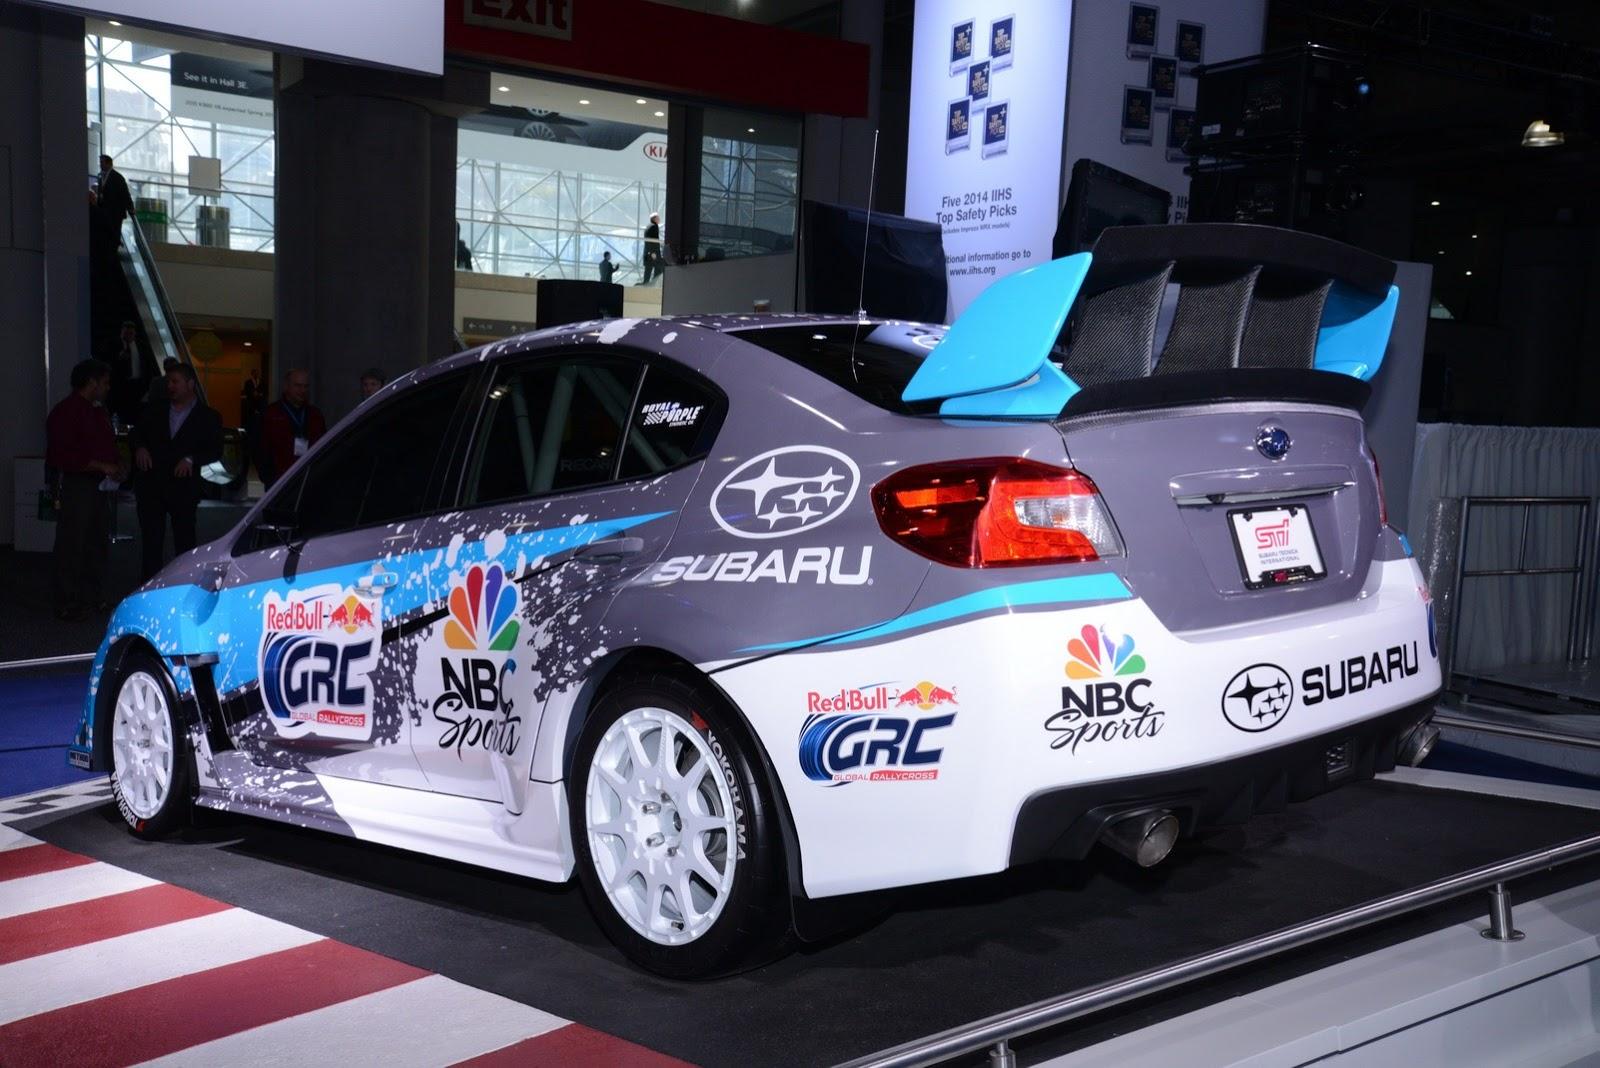 2014 - [Subaru] Impreza WRX/STi  - Page 5 Subaru-WRX_STI-GRC-2015-3%25255B3%25255D